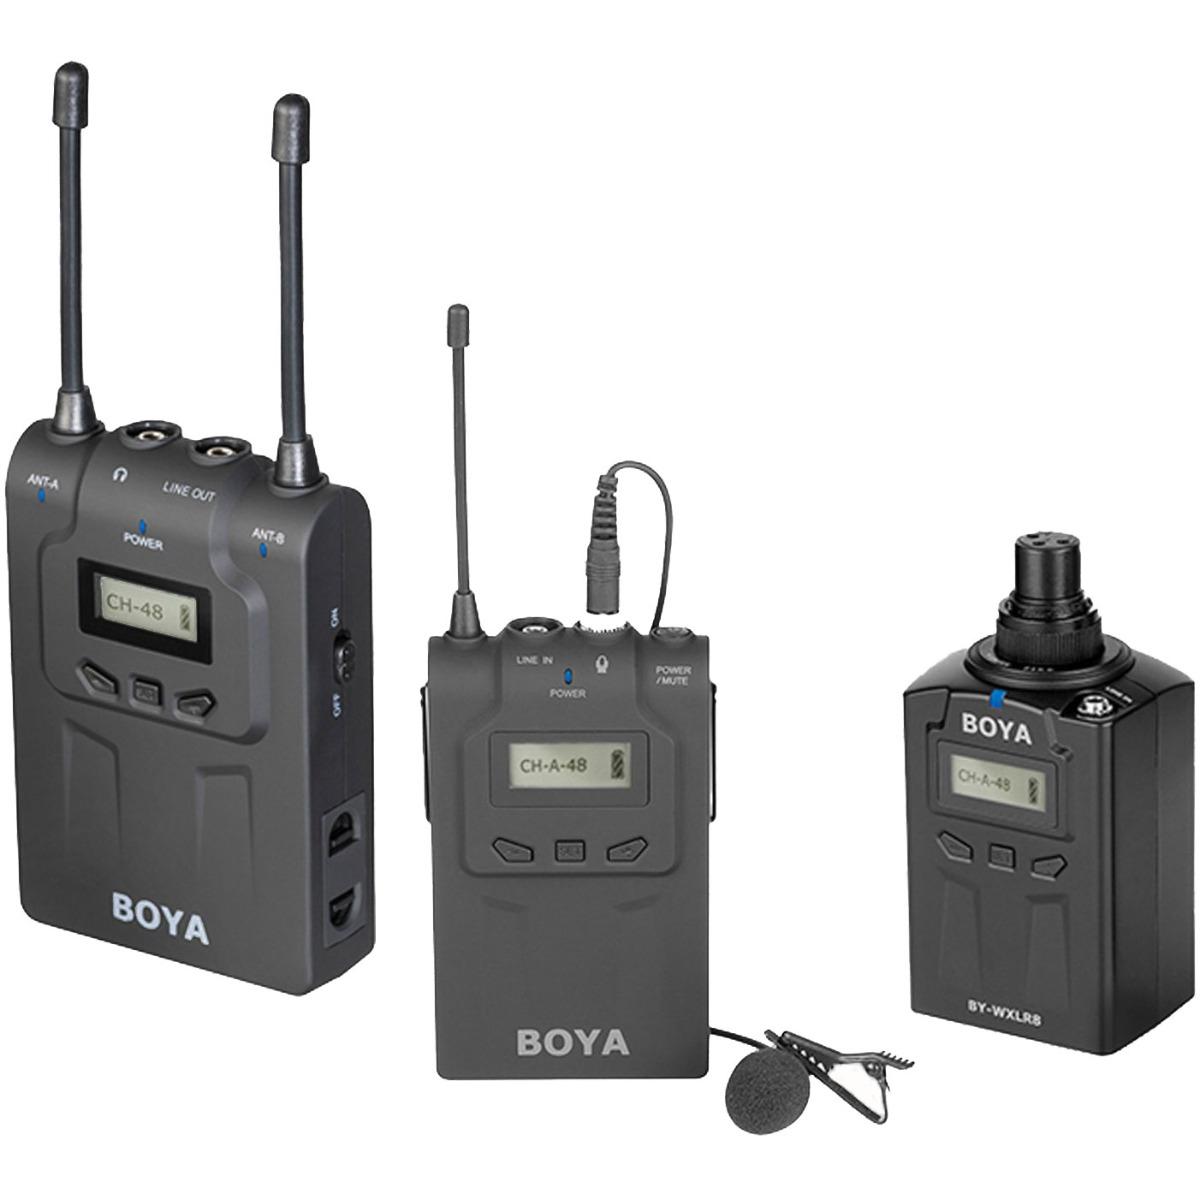 Boya BY-WM8-K6 trådløstsætmedklemme-mikrofonogXLR-sender